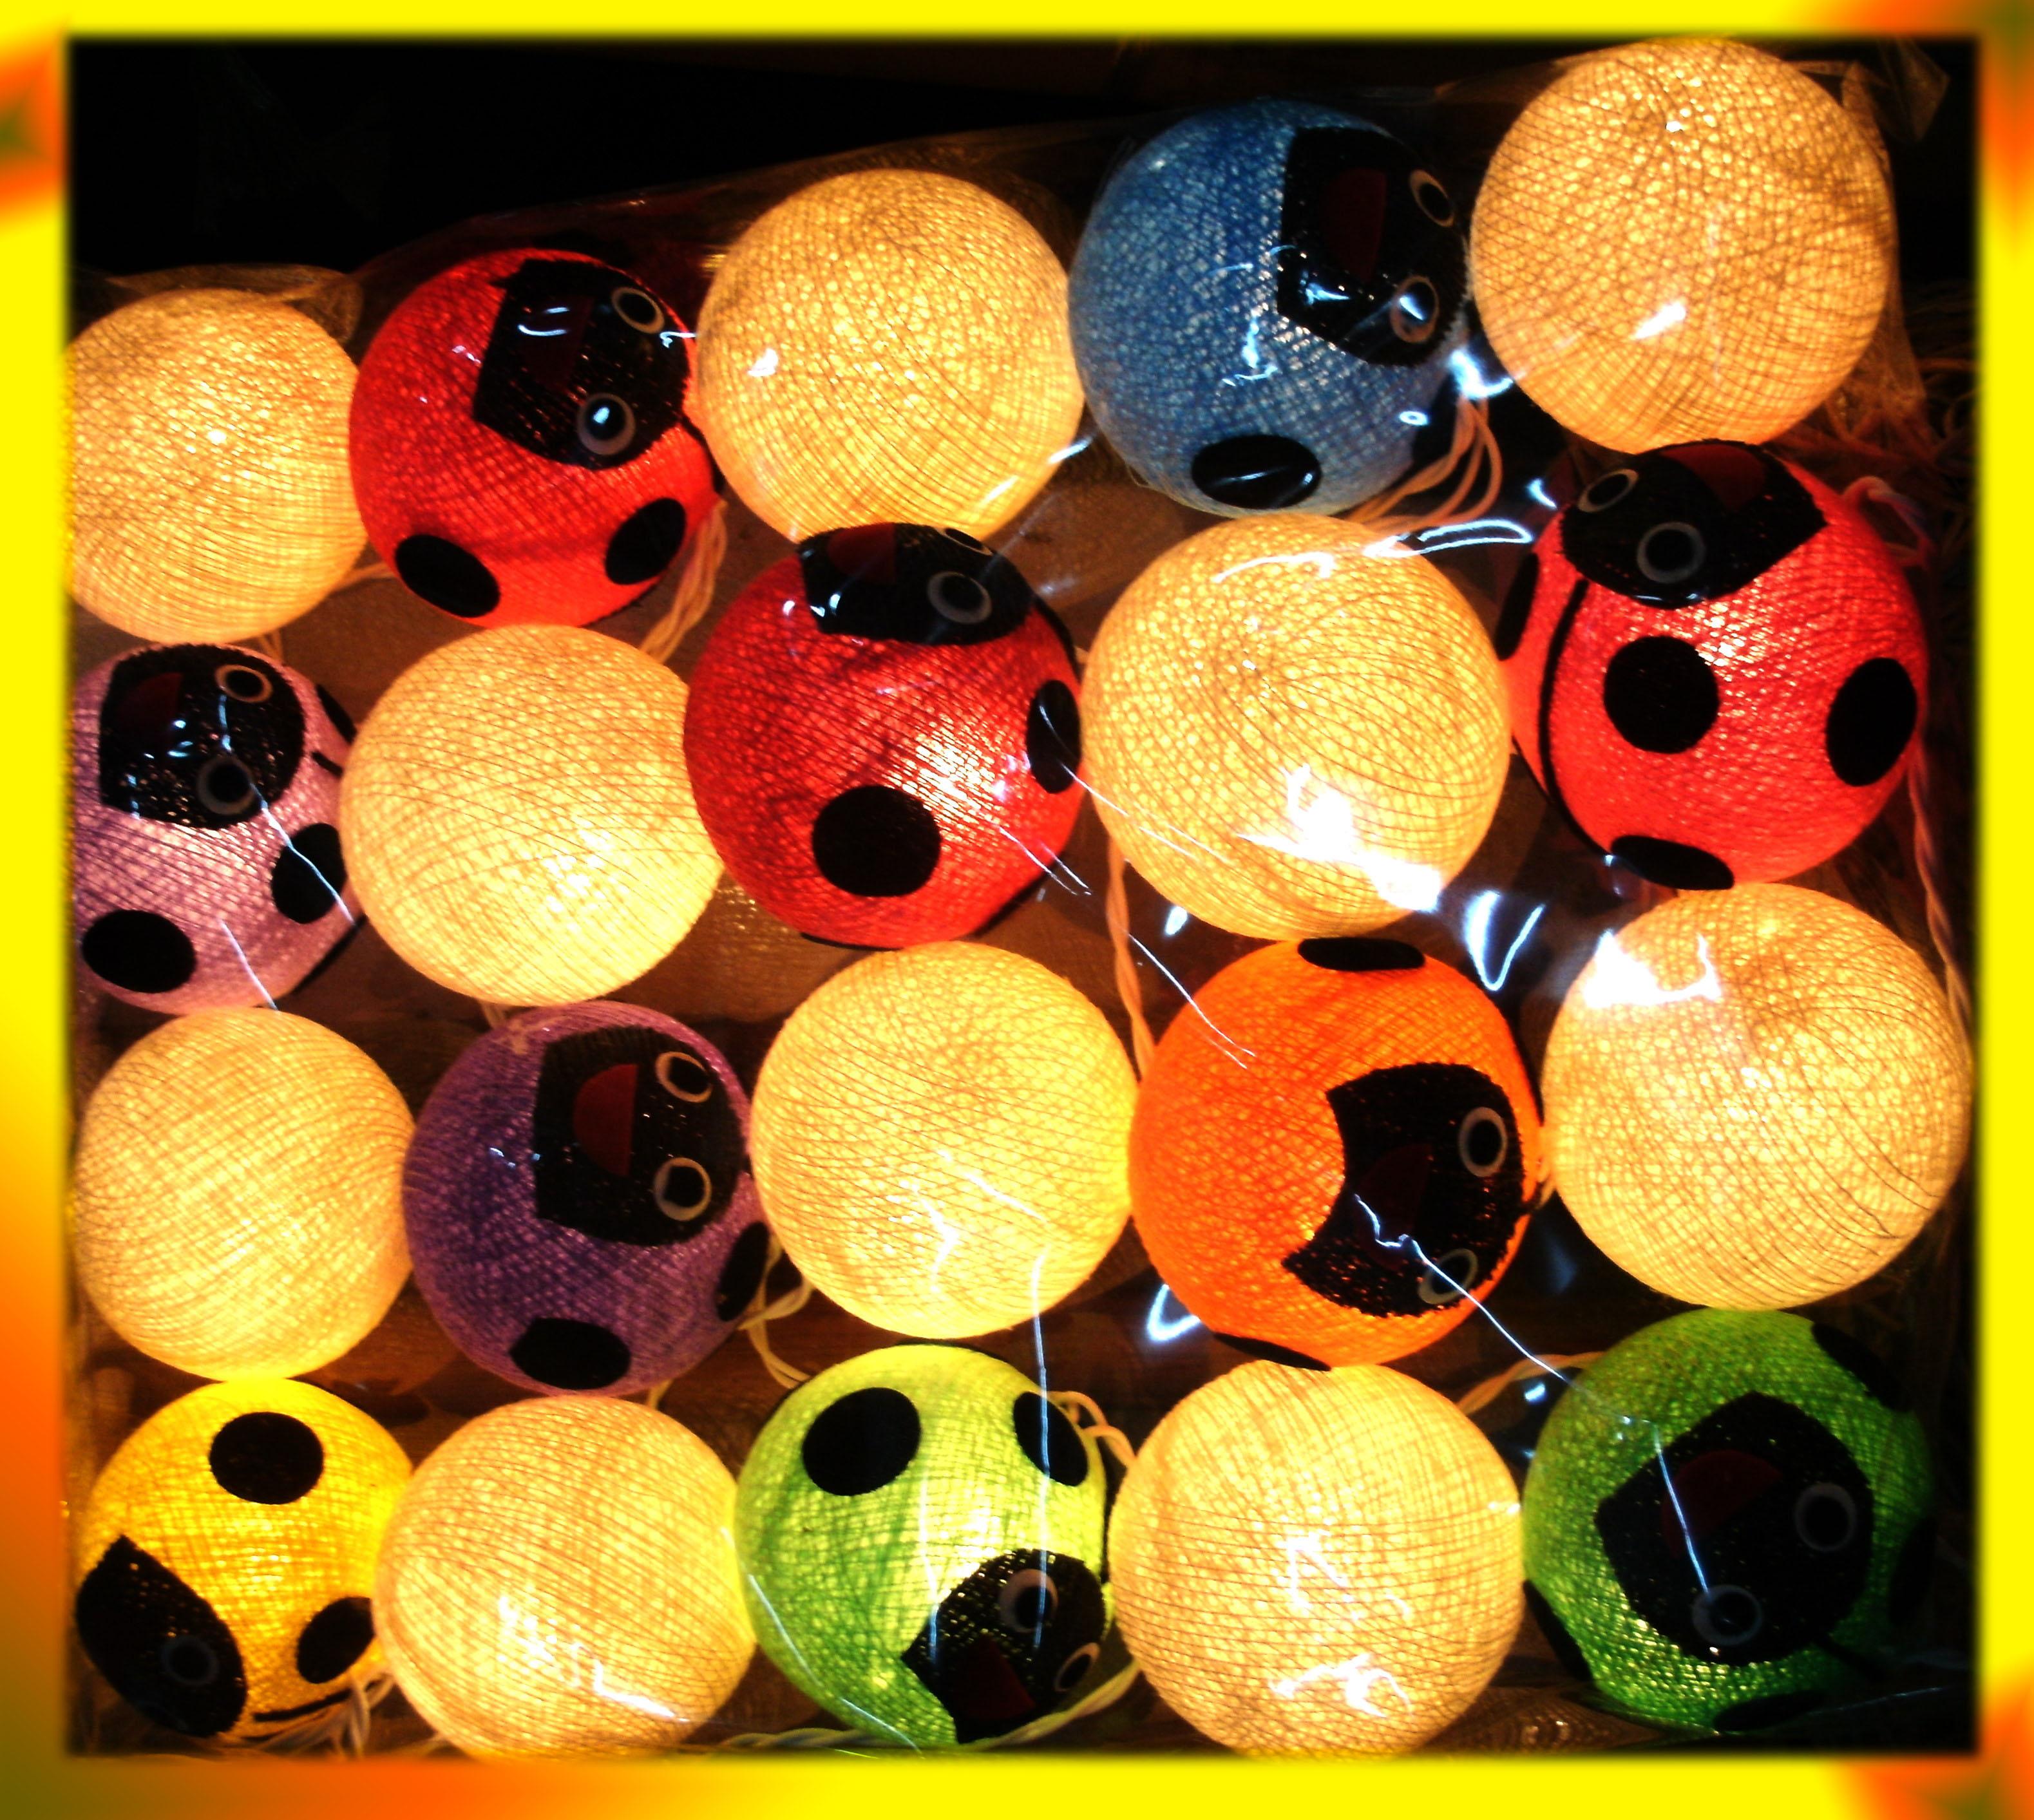 cotton ball- decorative